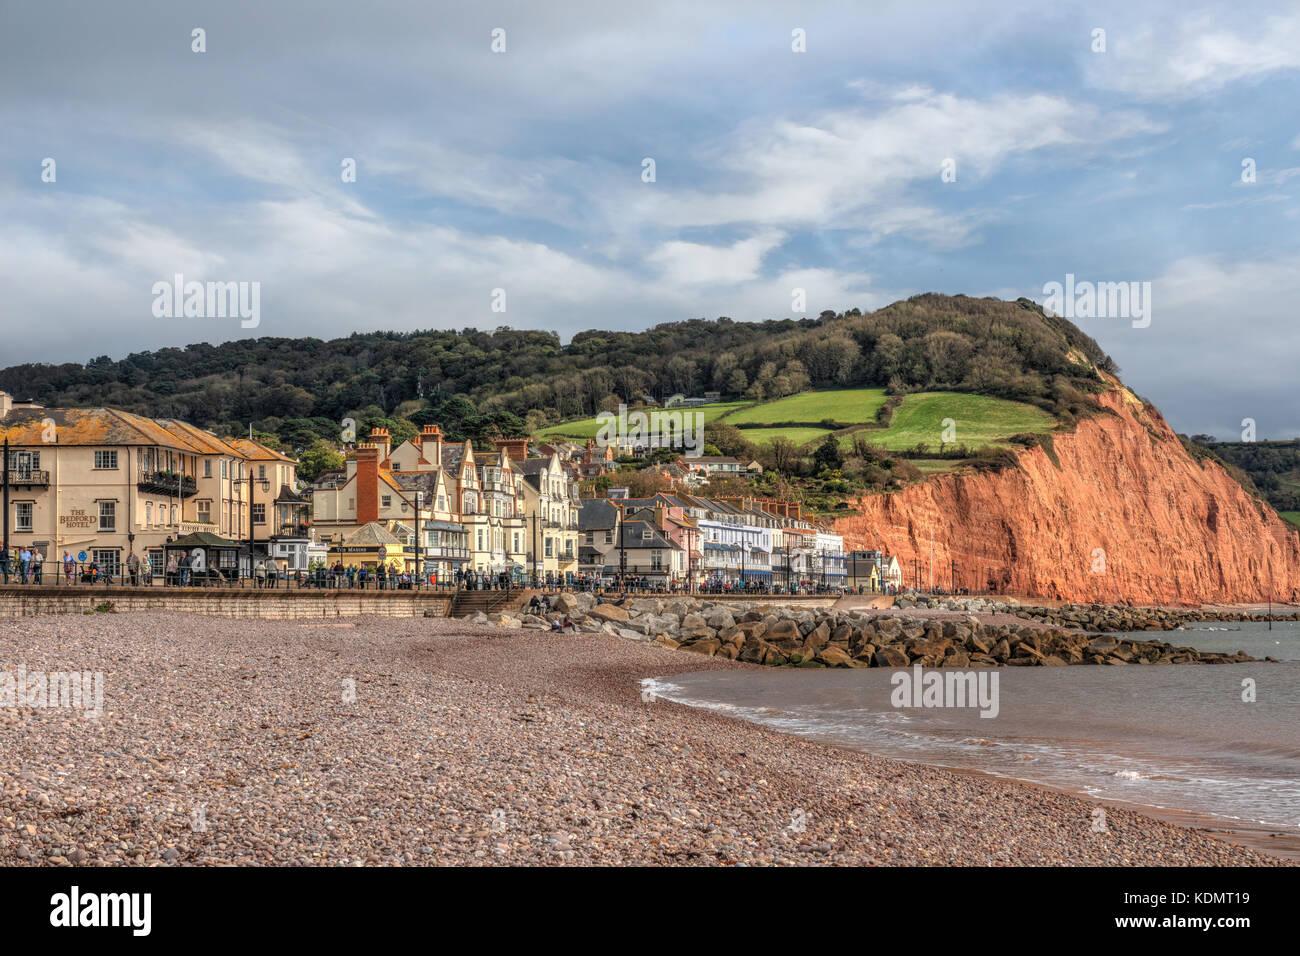 Sidmouth, Devon, England, United Kingdom - Stock Image